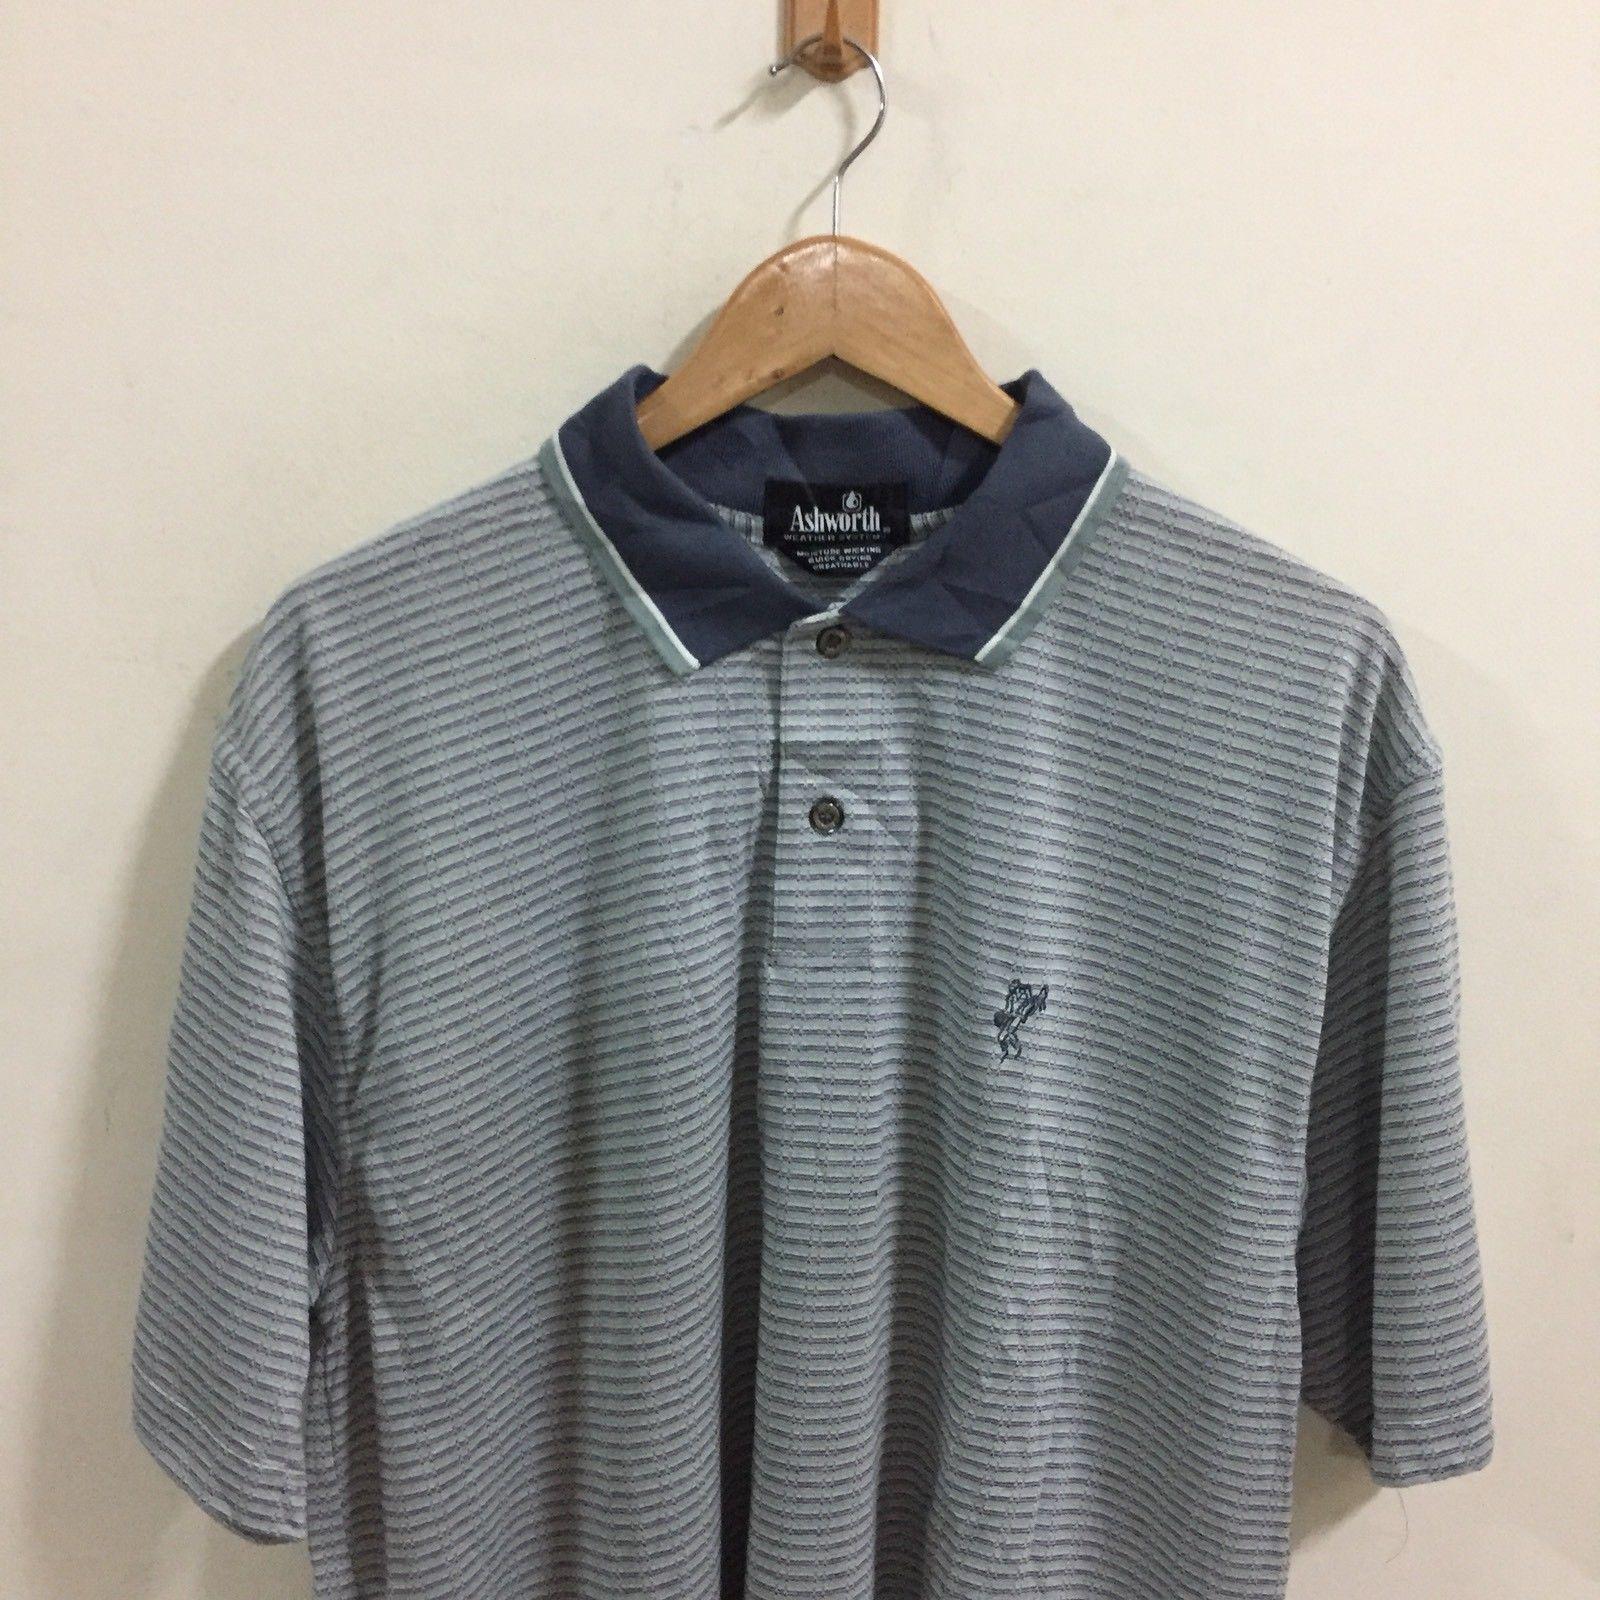 Ashworth Golf polo Shirt Men's Size Medium Stripe Made In USA S/S